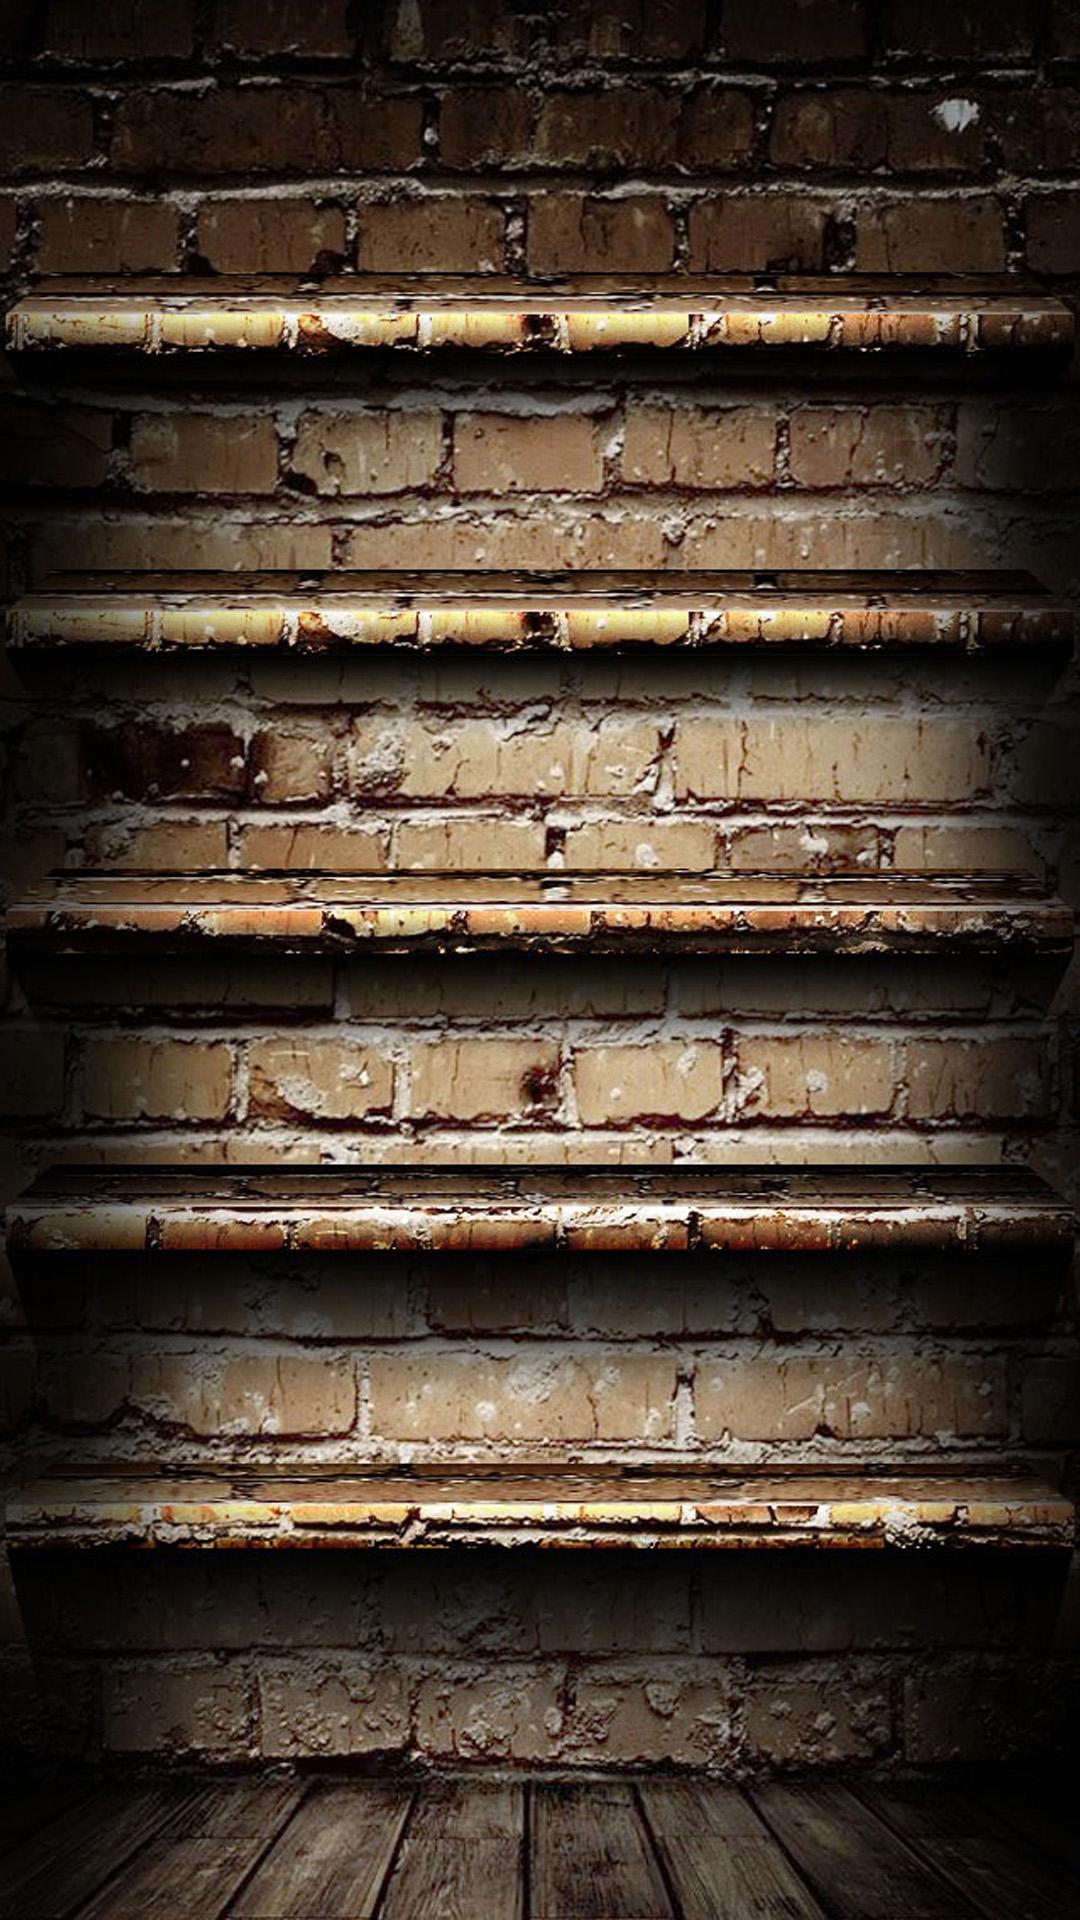 Shelf iPhone 6 Plus Wallpaper 142 iPhone 6 Plus Wallpapers HD 1080x1920